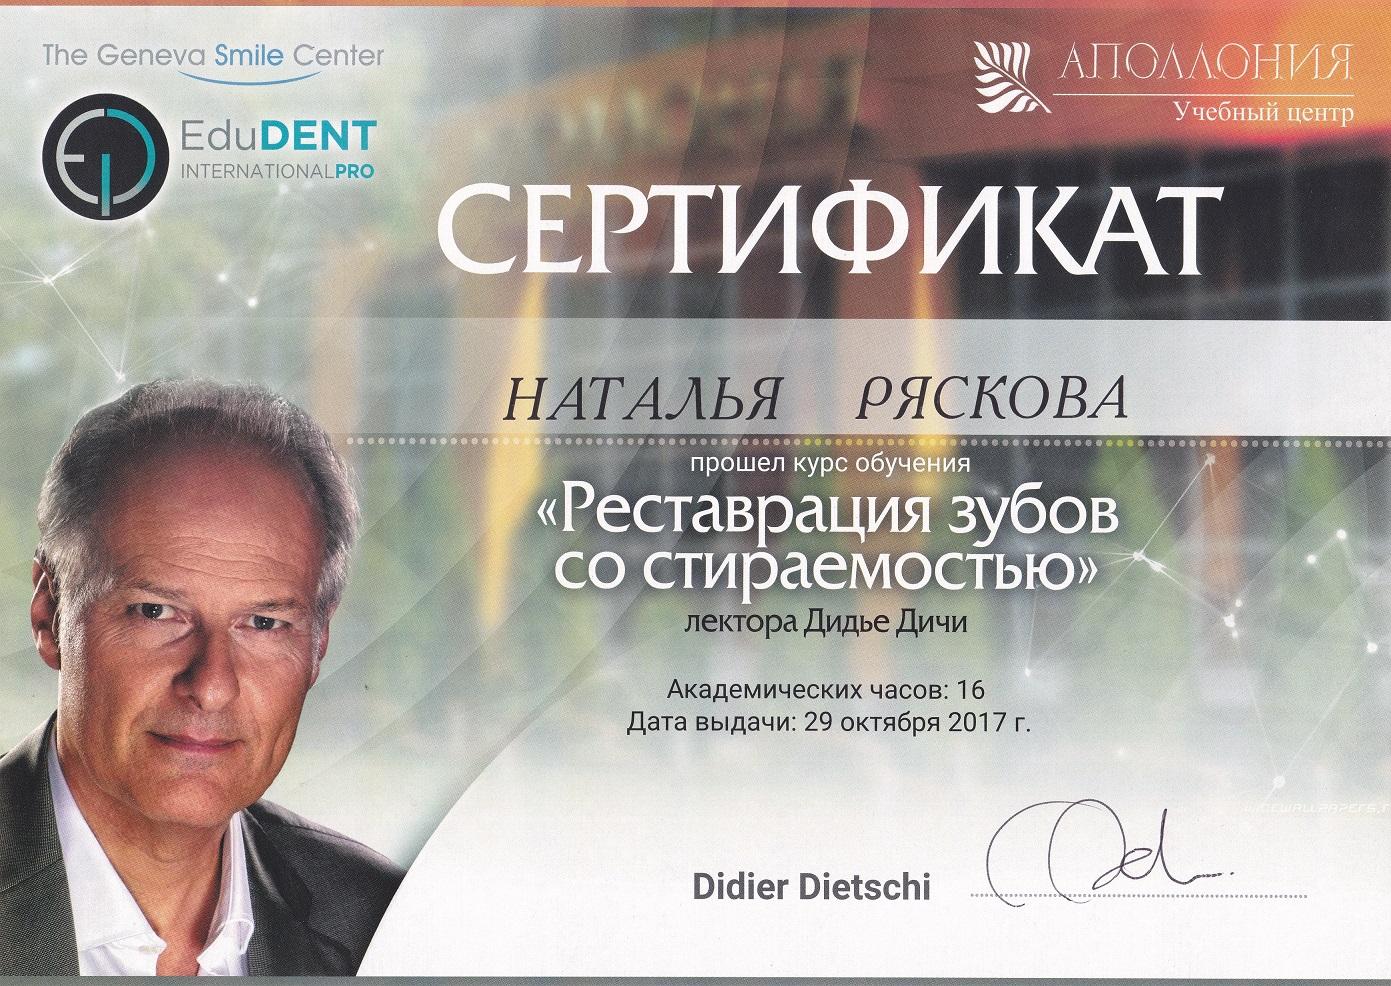 https://oris-vidnoe.ru/wp-content/uploads/2021/05/ryaskova3.jpg